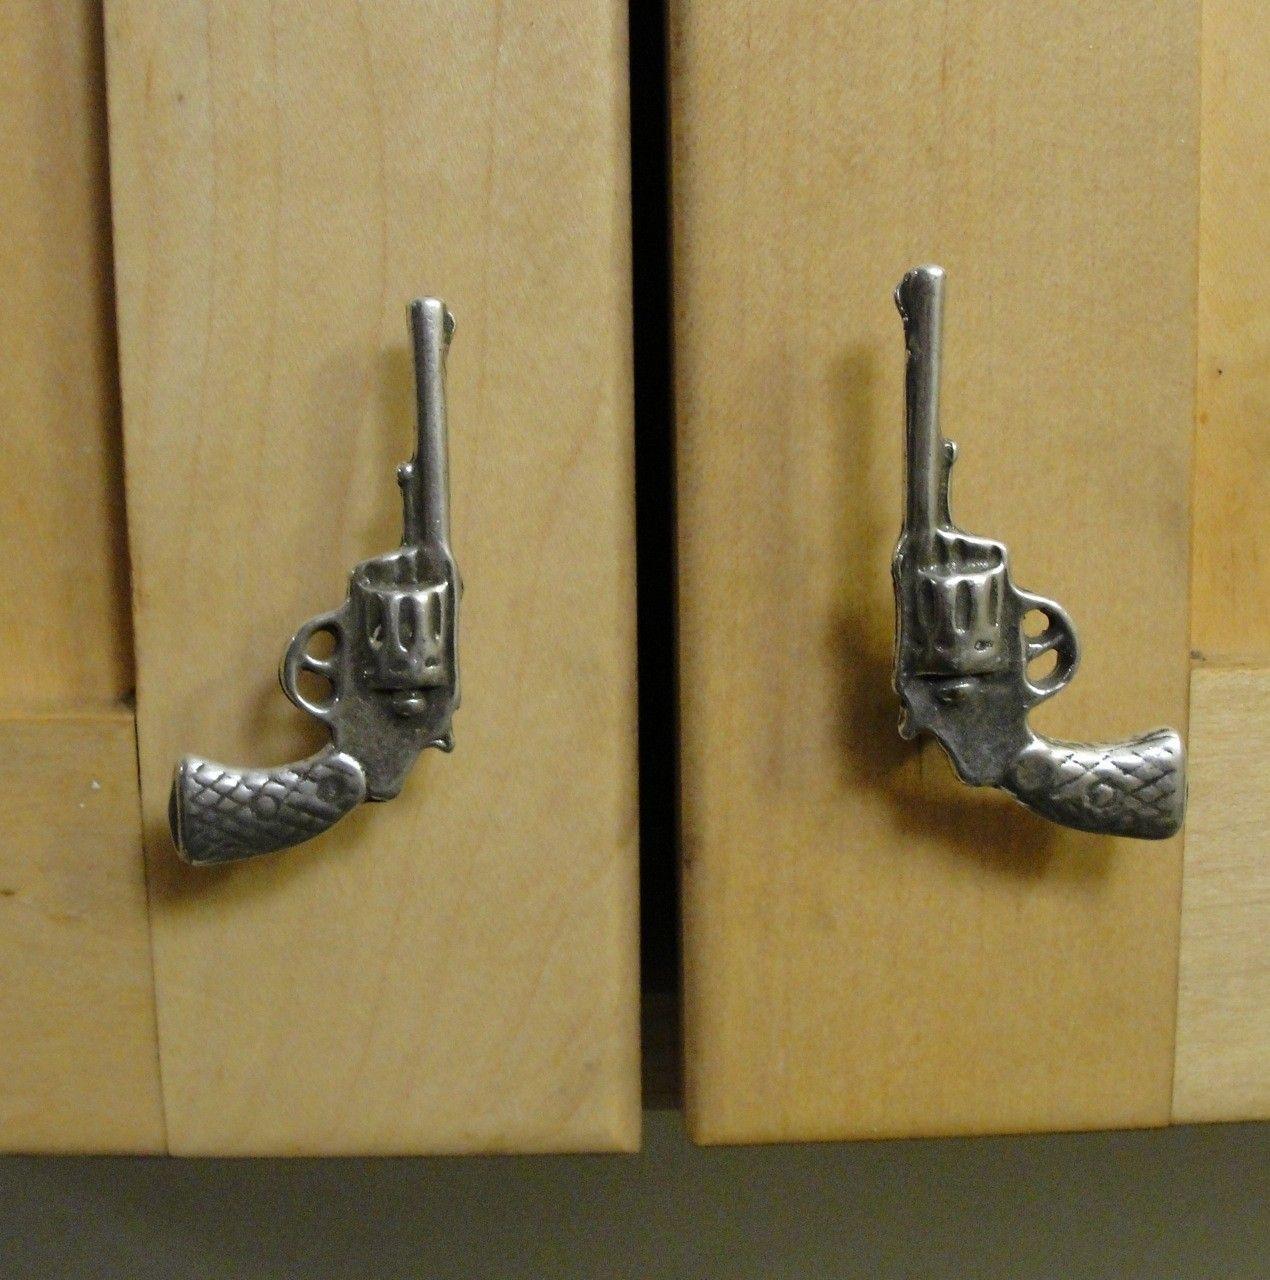 Special lisitng for Diane gun knob pistol cabinet pull hardware Blue ...